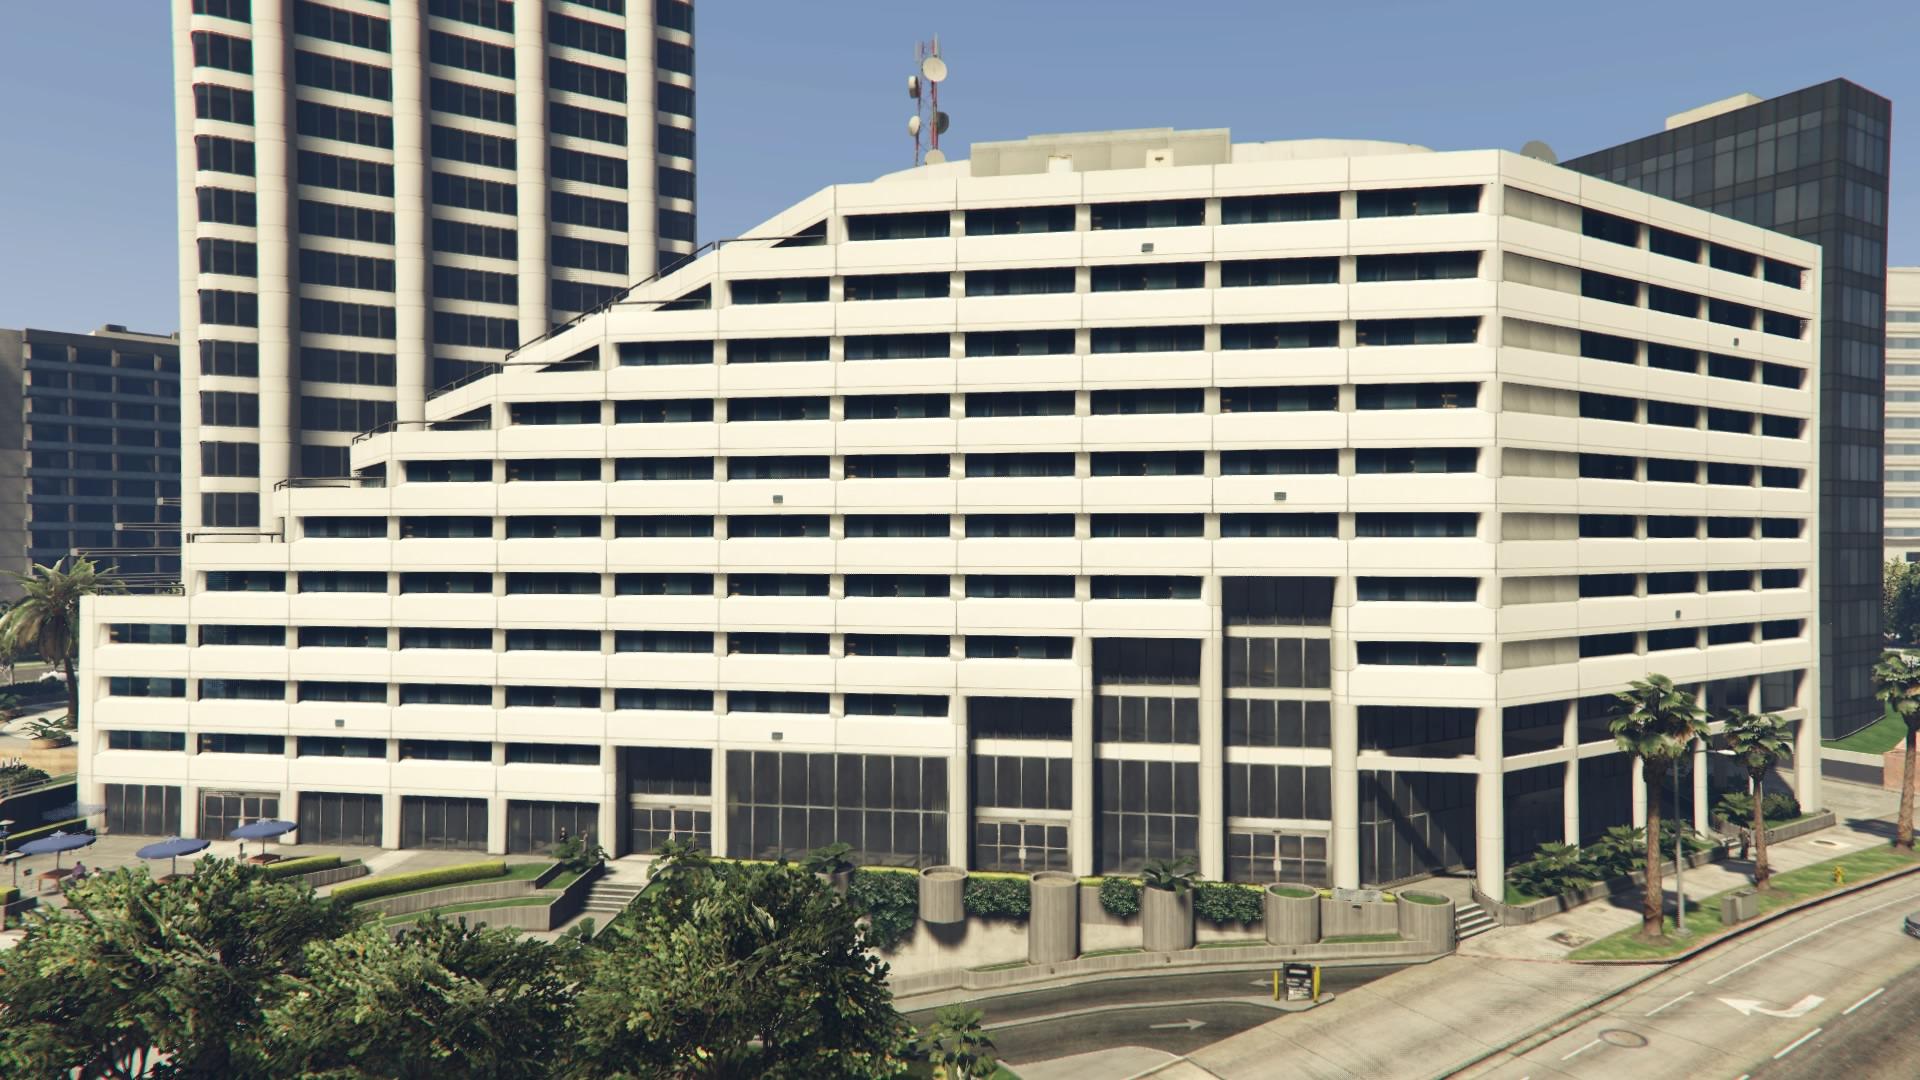 Bluff Tower